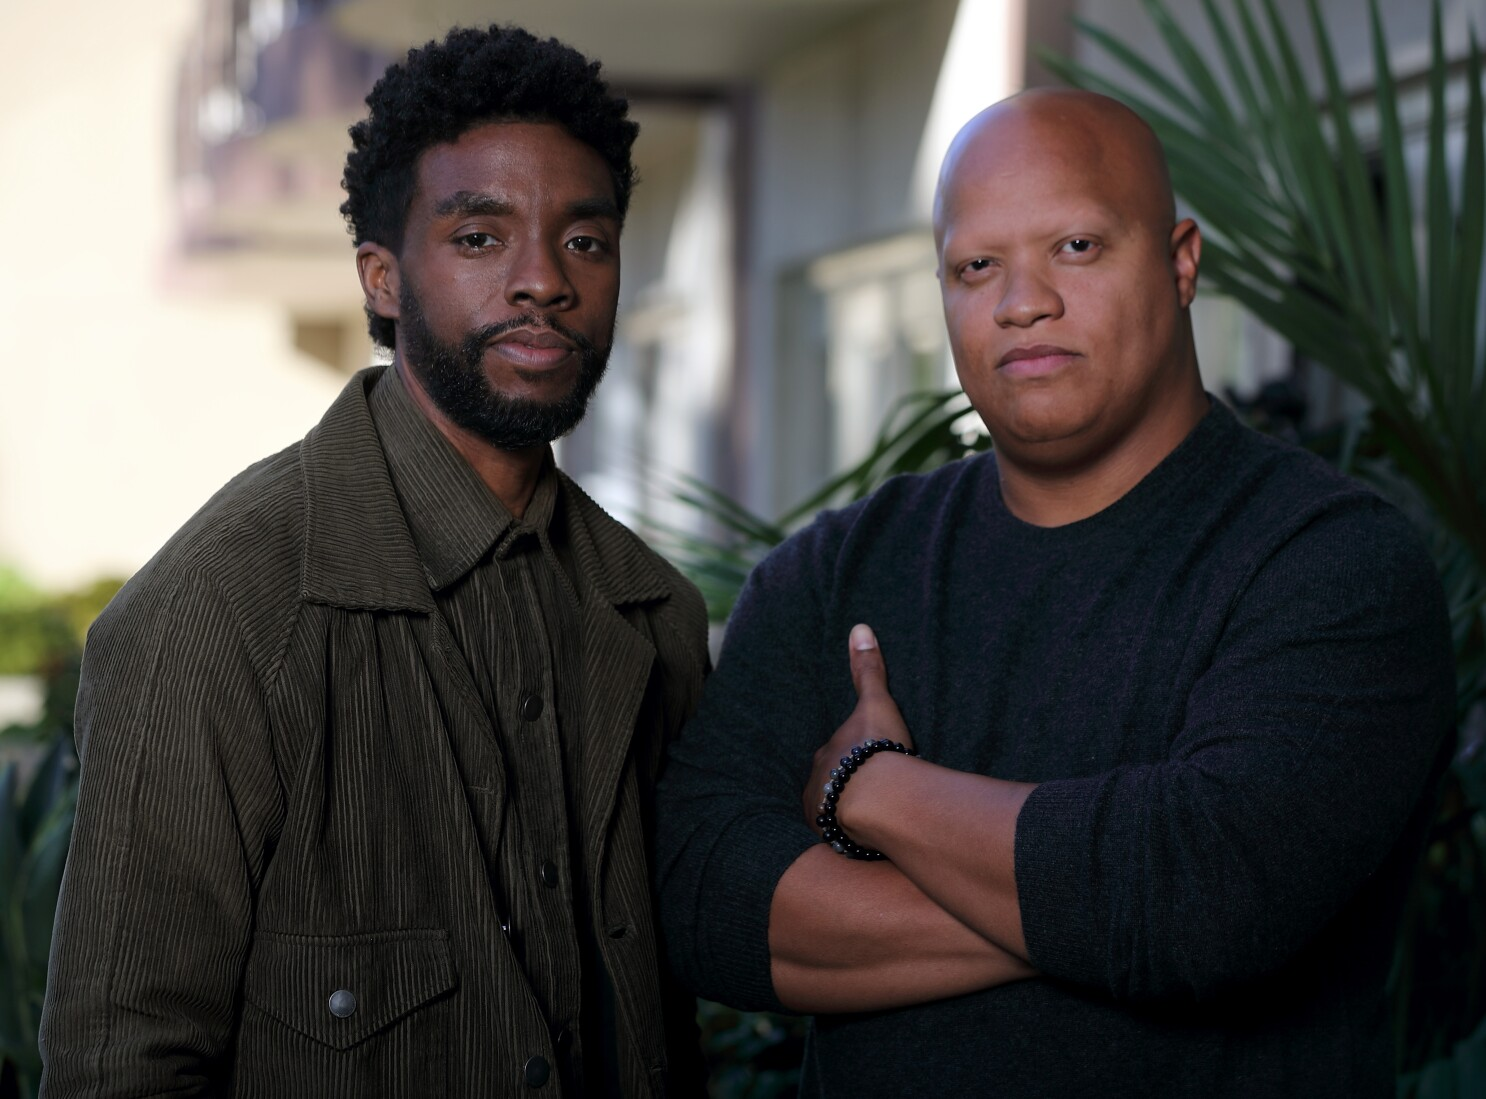 How Chadwick Boseman made '21 Bridges' diverse - Los Angeles Times